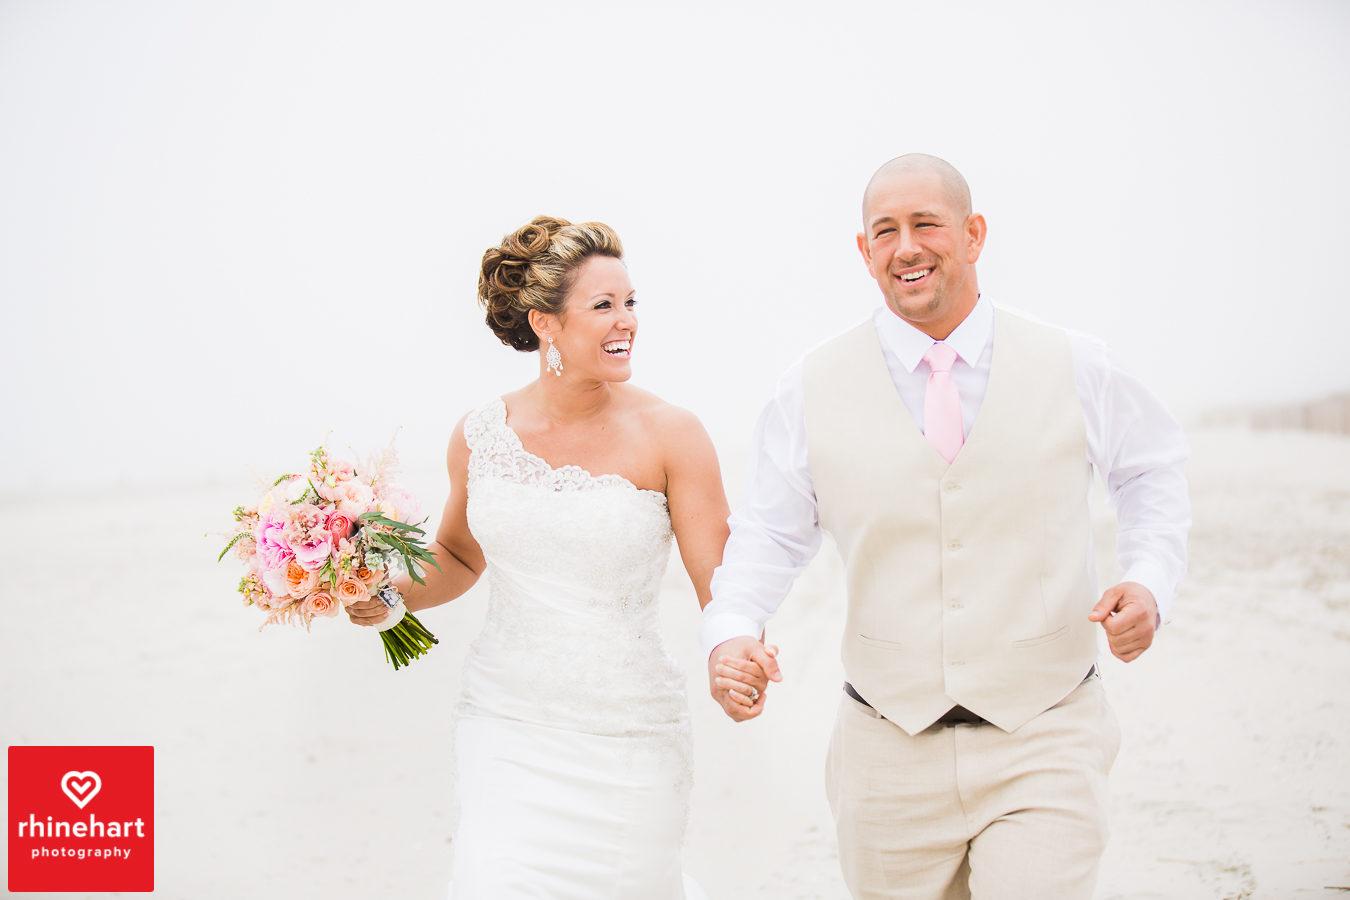 reeds-stone-harbor-wedding-photographer-110